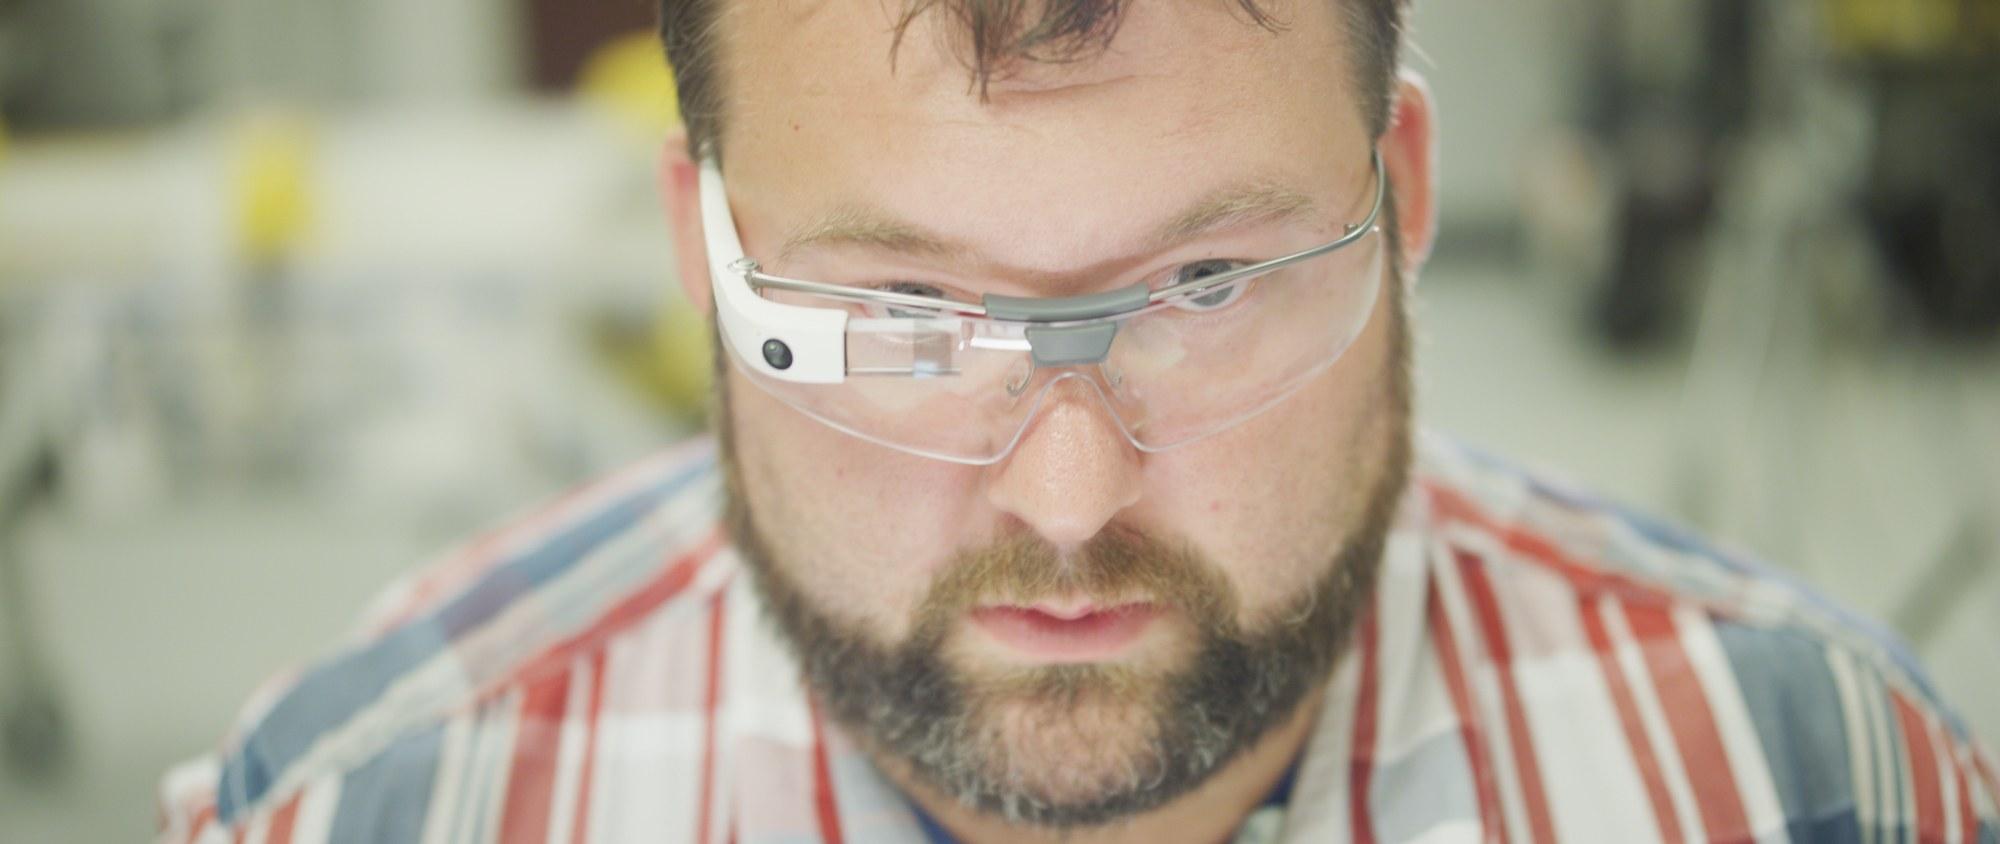 google glass 2.0 empresarial